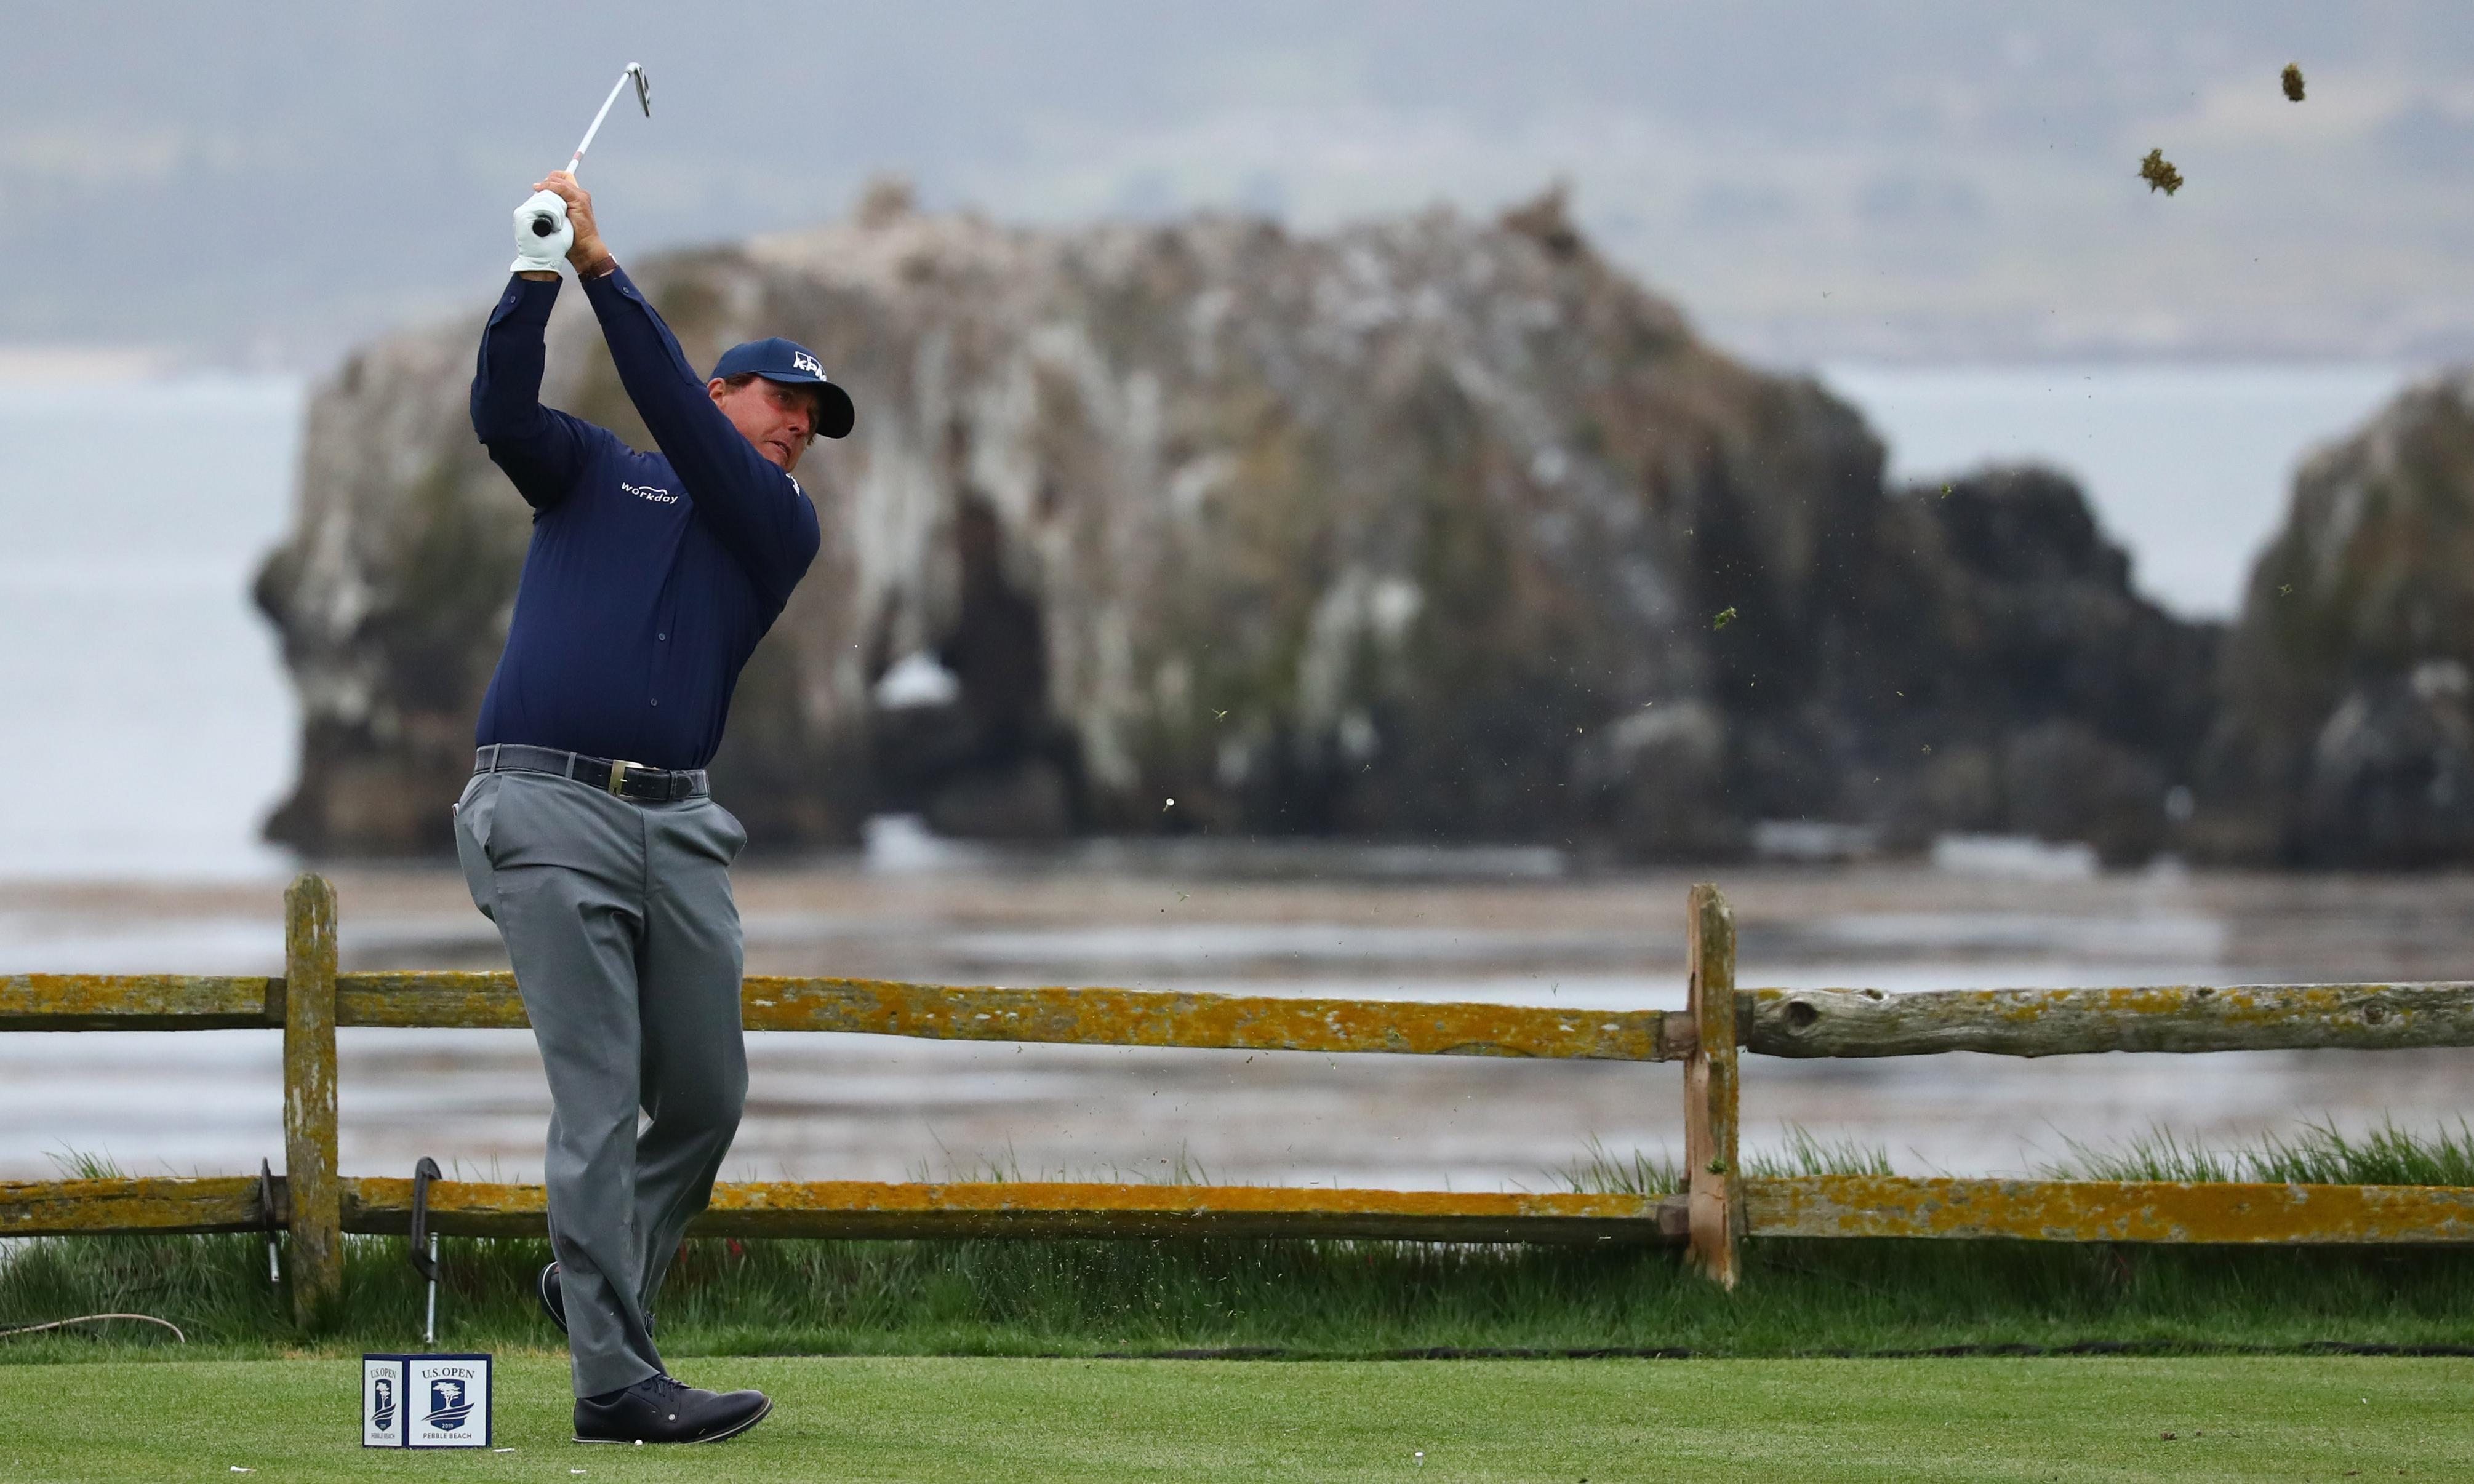 Phil Mickelson springs major surprise by praising USGA over Pebble Beach